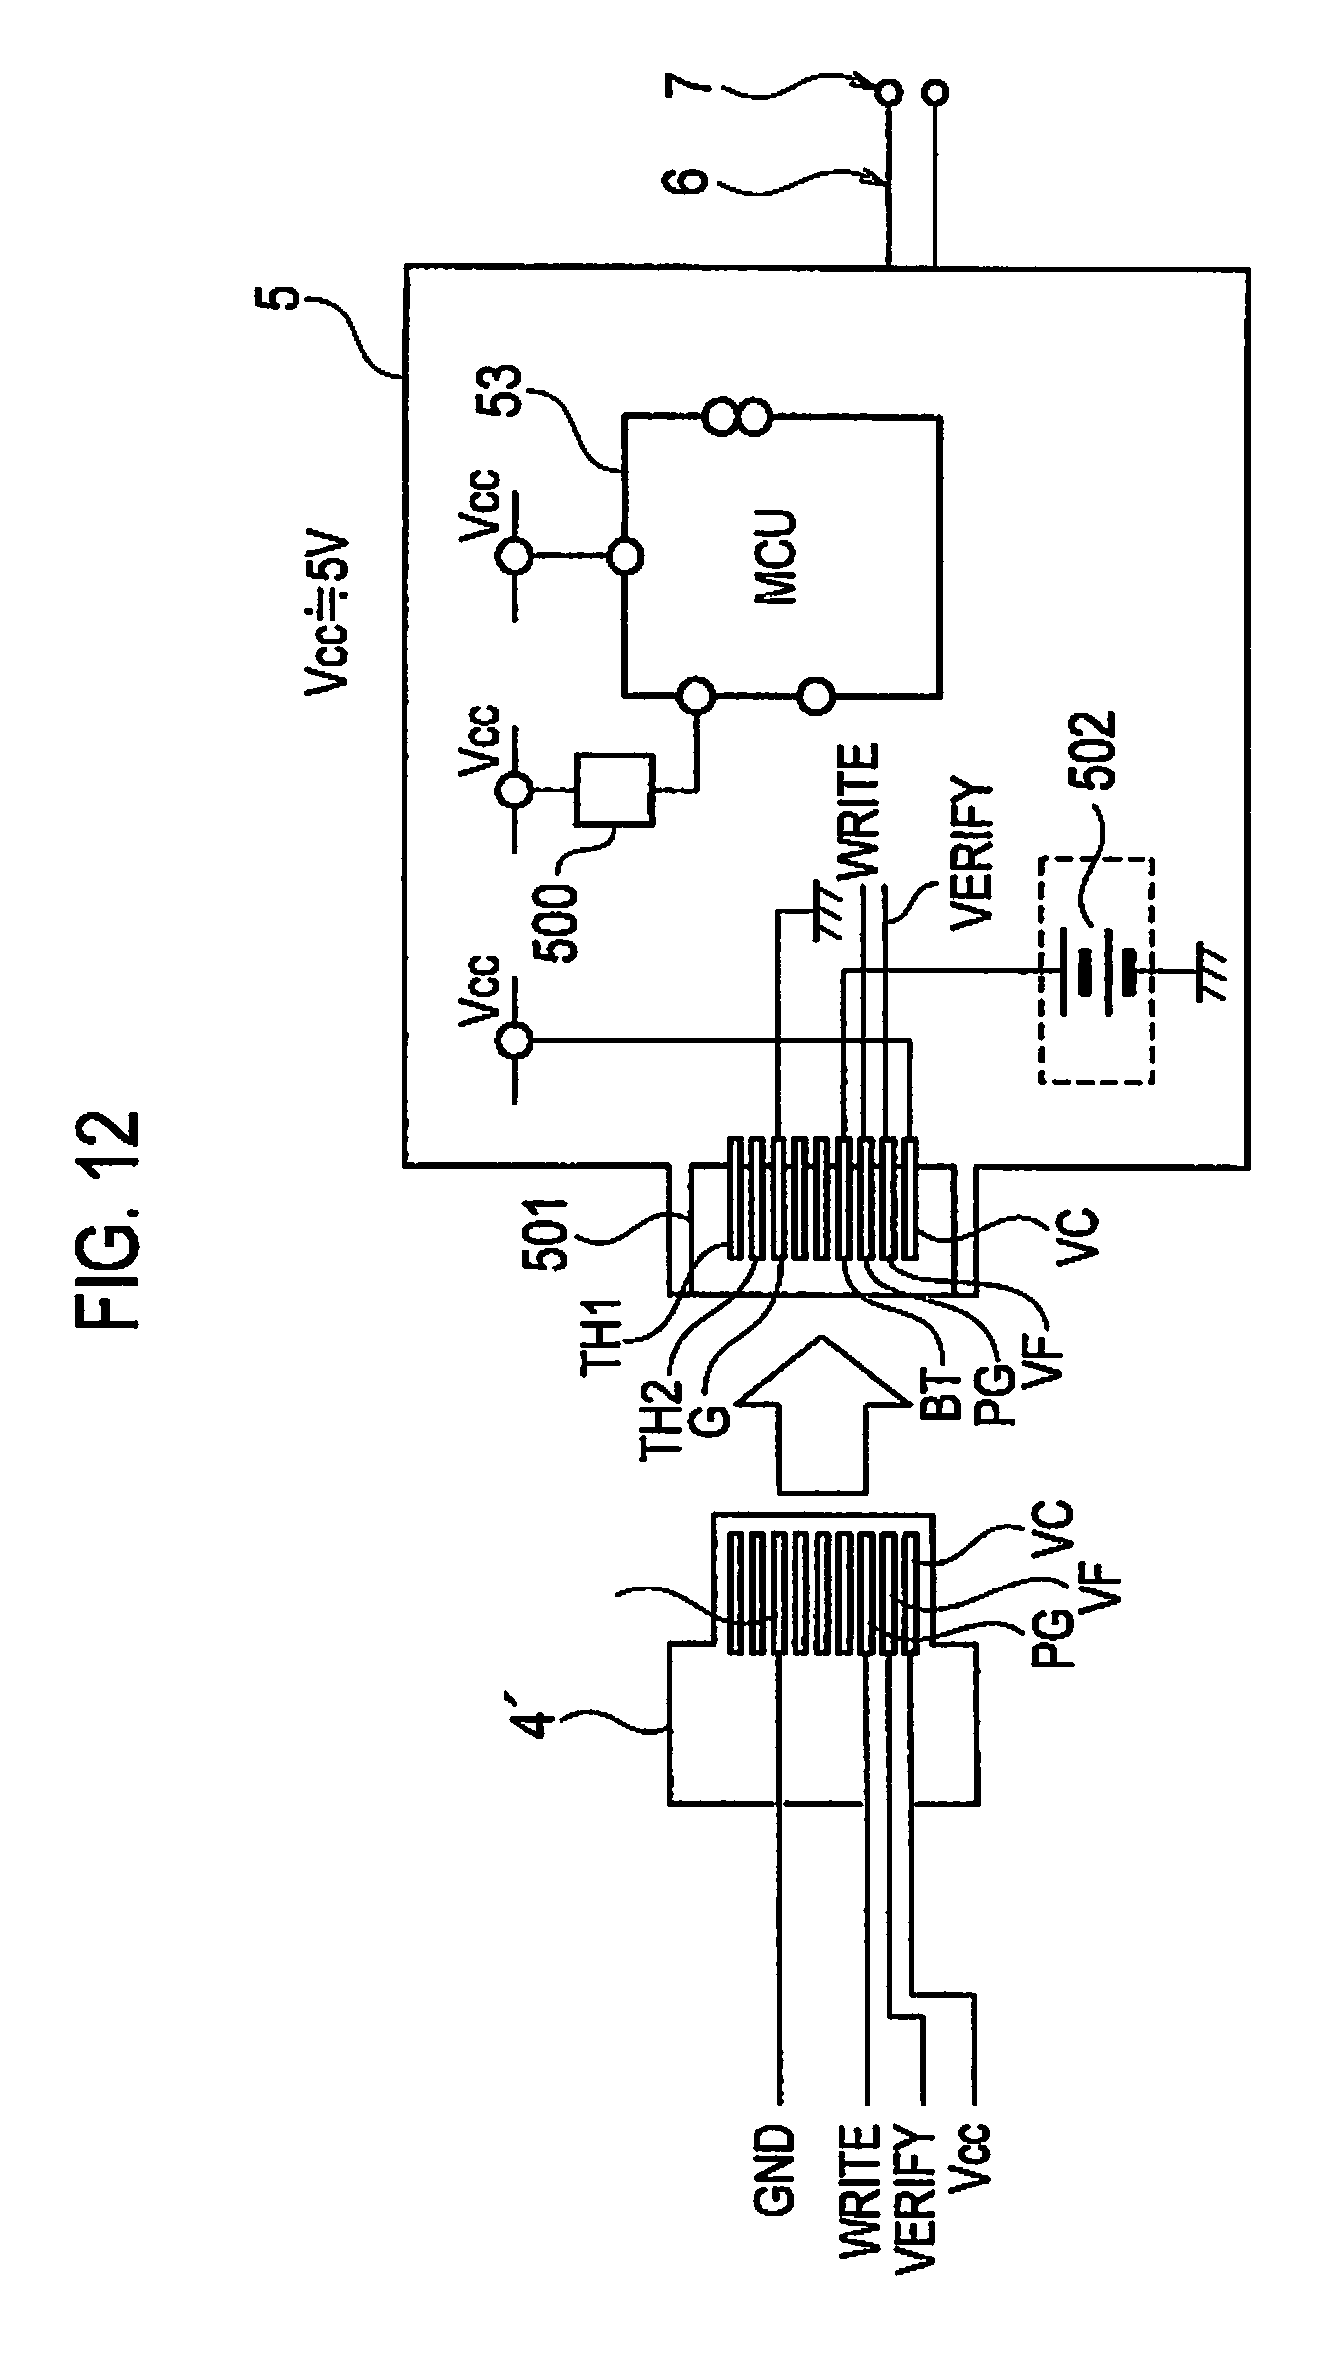 qr 0100 wiring diagram   22 wiring diagram images